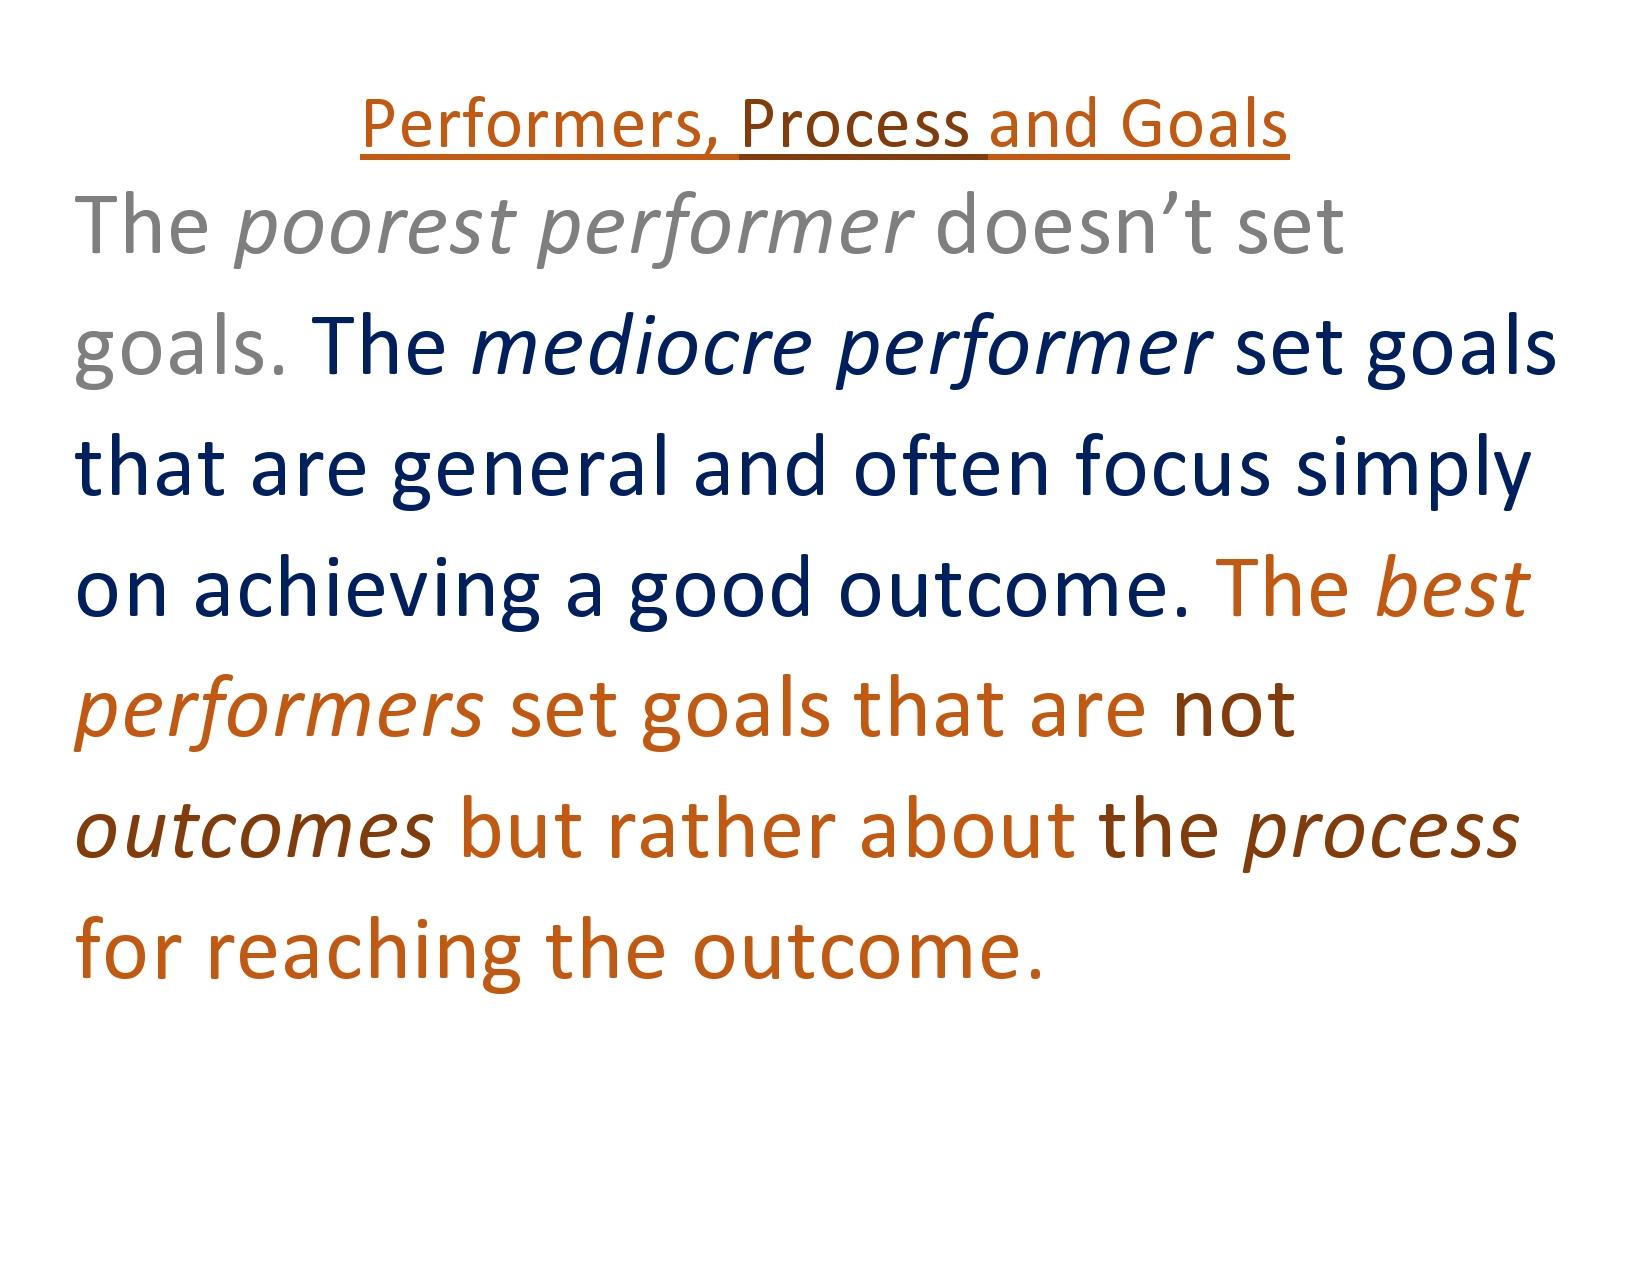 Inspiration - Performance and Procedure.jpg